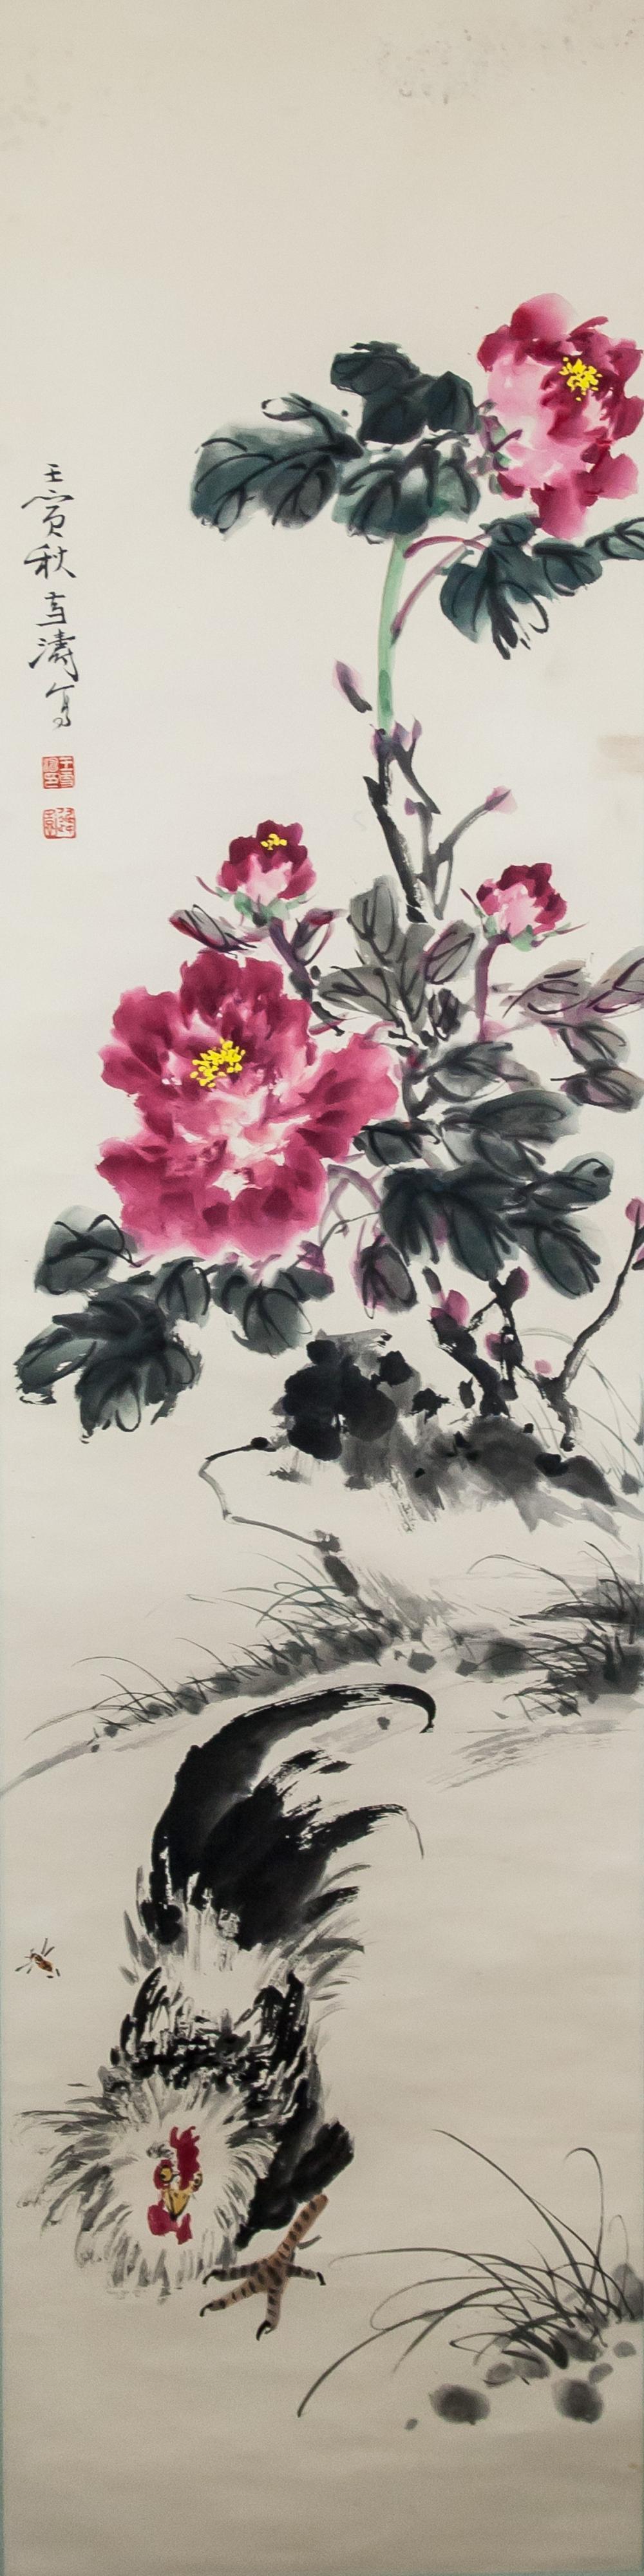 Wang Xuetao 1903-1982 Chinese Watercolor Rooster